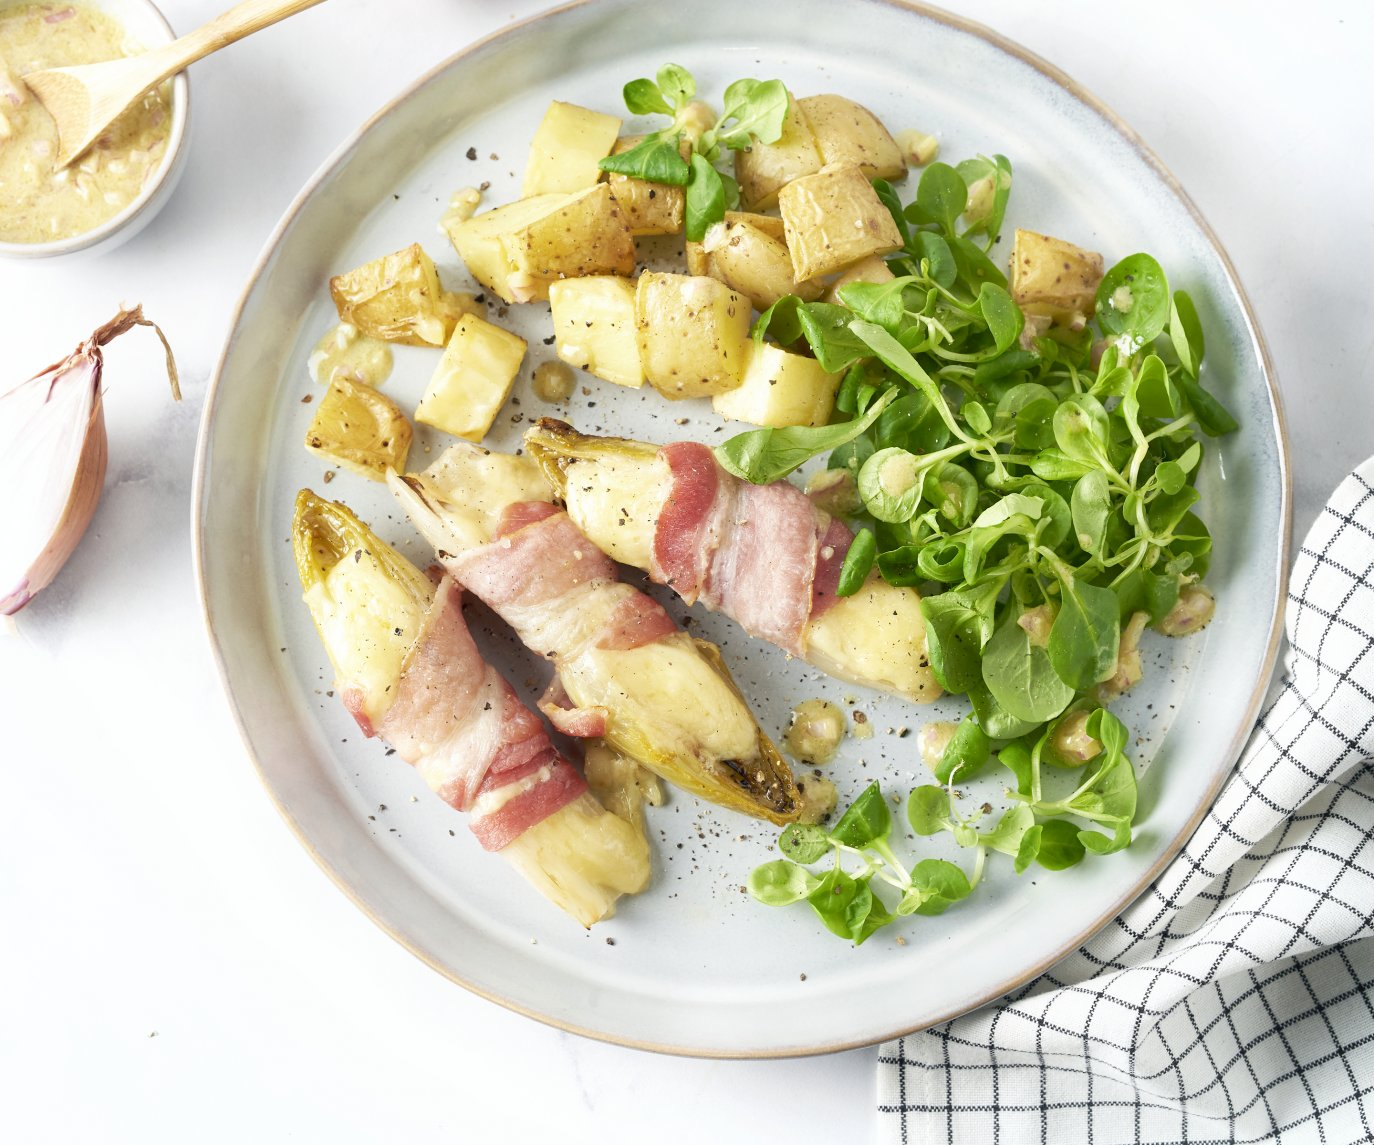 Witloofbootjes met spek en kaas, veldsla en geroosterde aardappelen